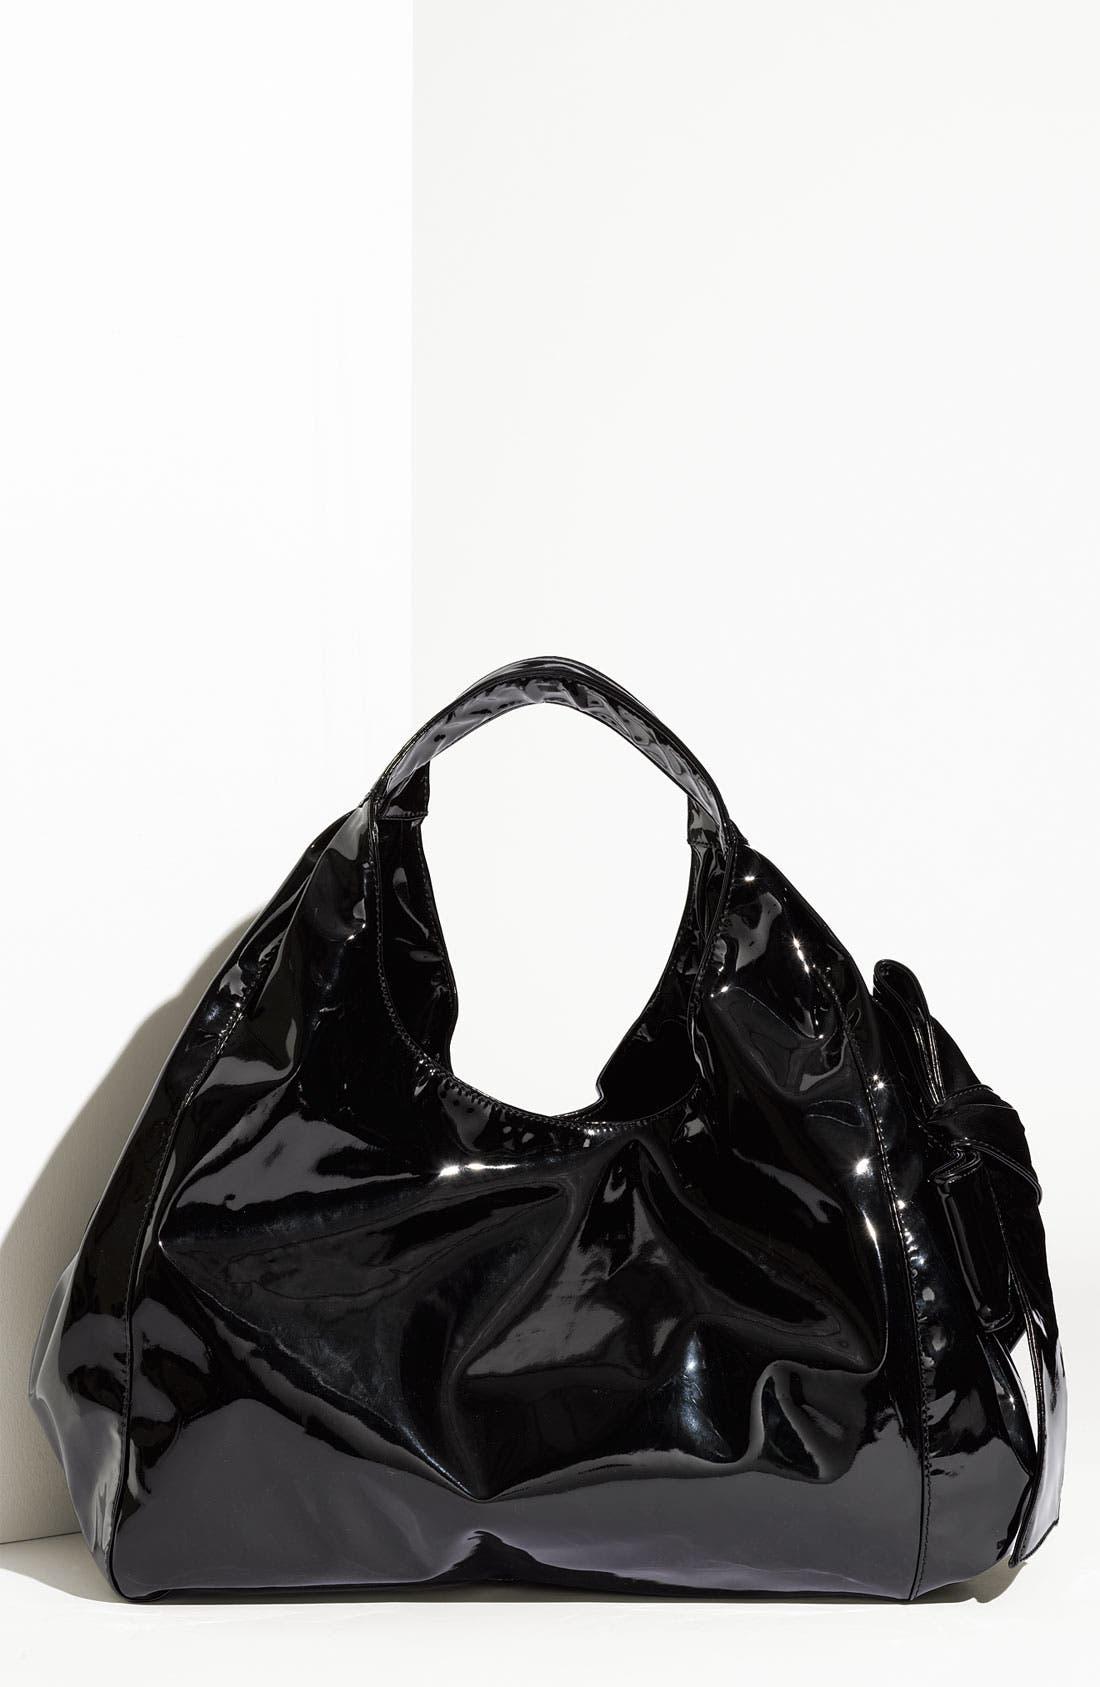 Alternate Image 1 Selected - Valentino 'Lacca Nuage - Large' Hobo